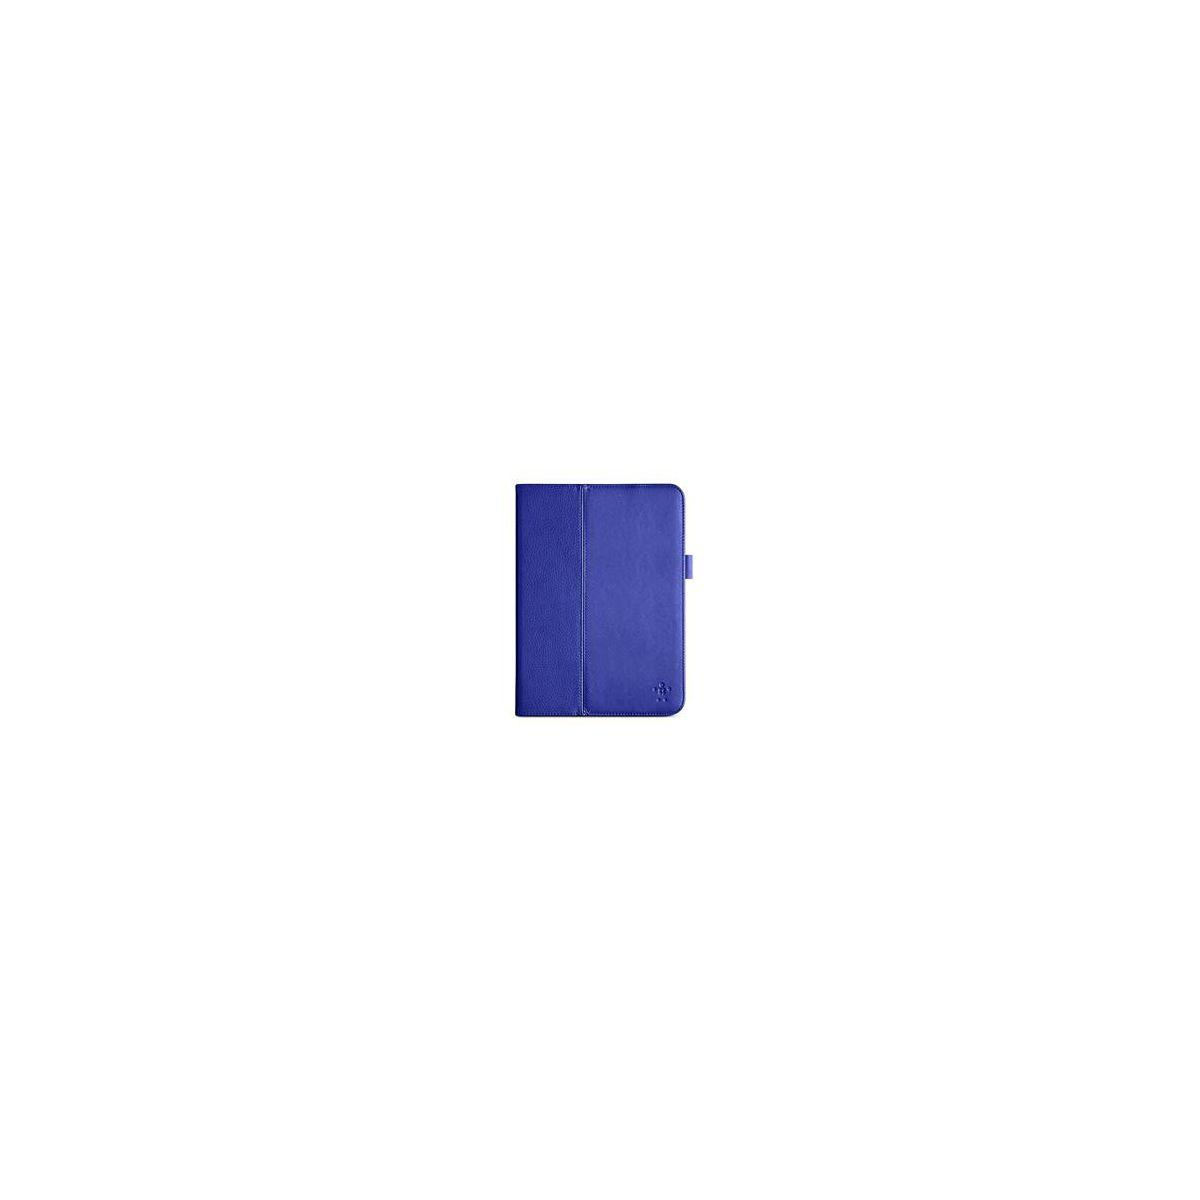 Folio belkin galaxy tab 4 10'' multitasker cuir violet - 20% de remise immédiate avec le code : multi20 (photo)